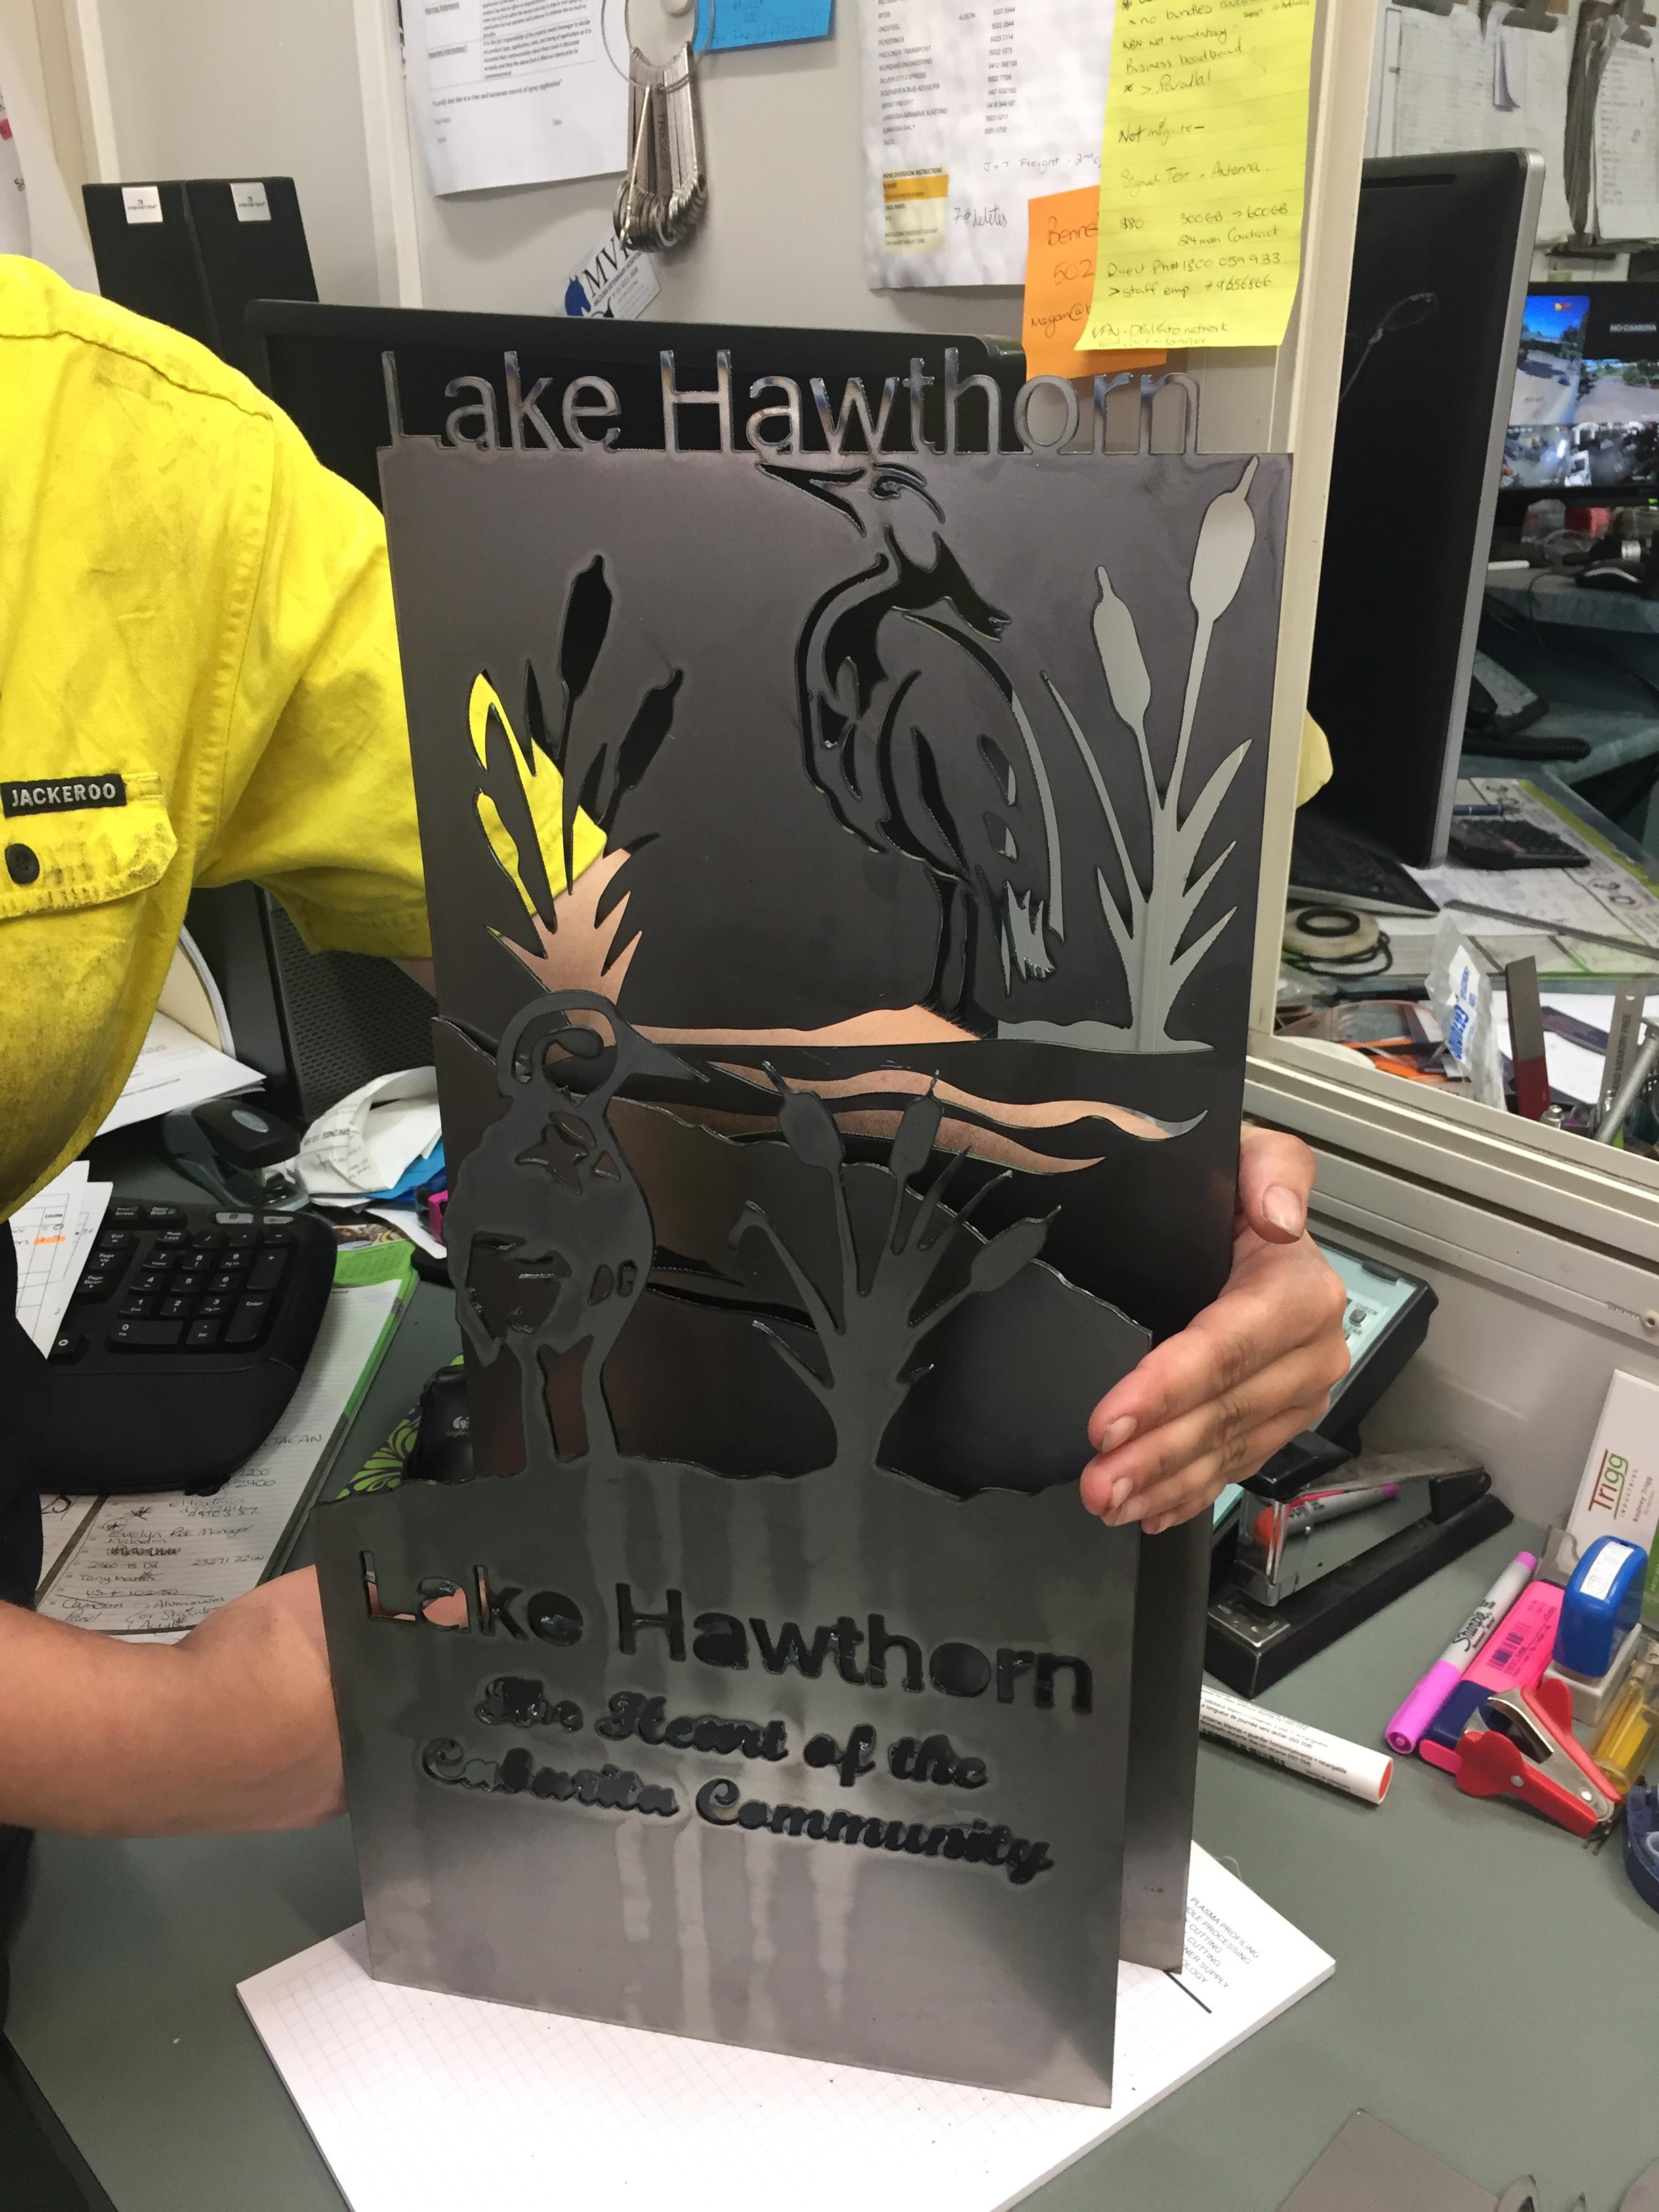 Lake Hawthorn Signs